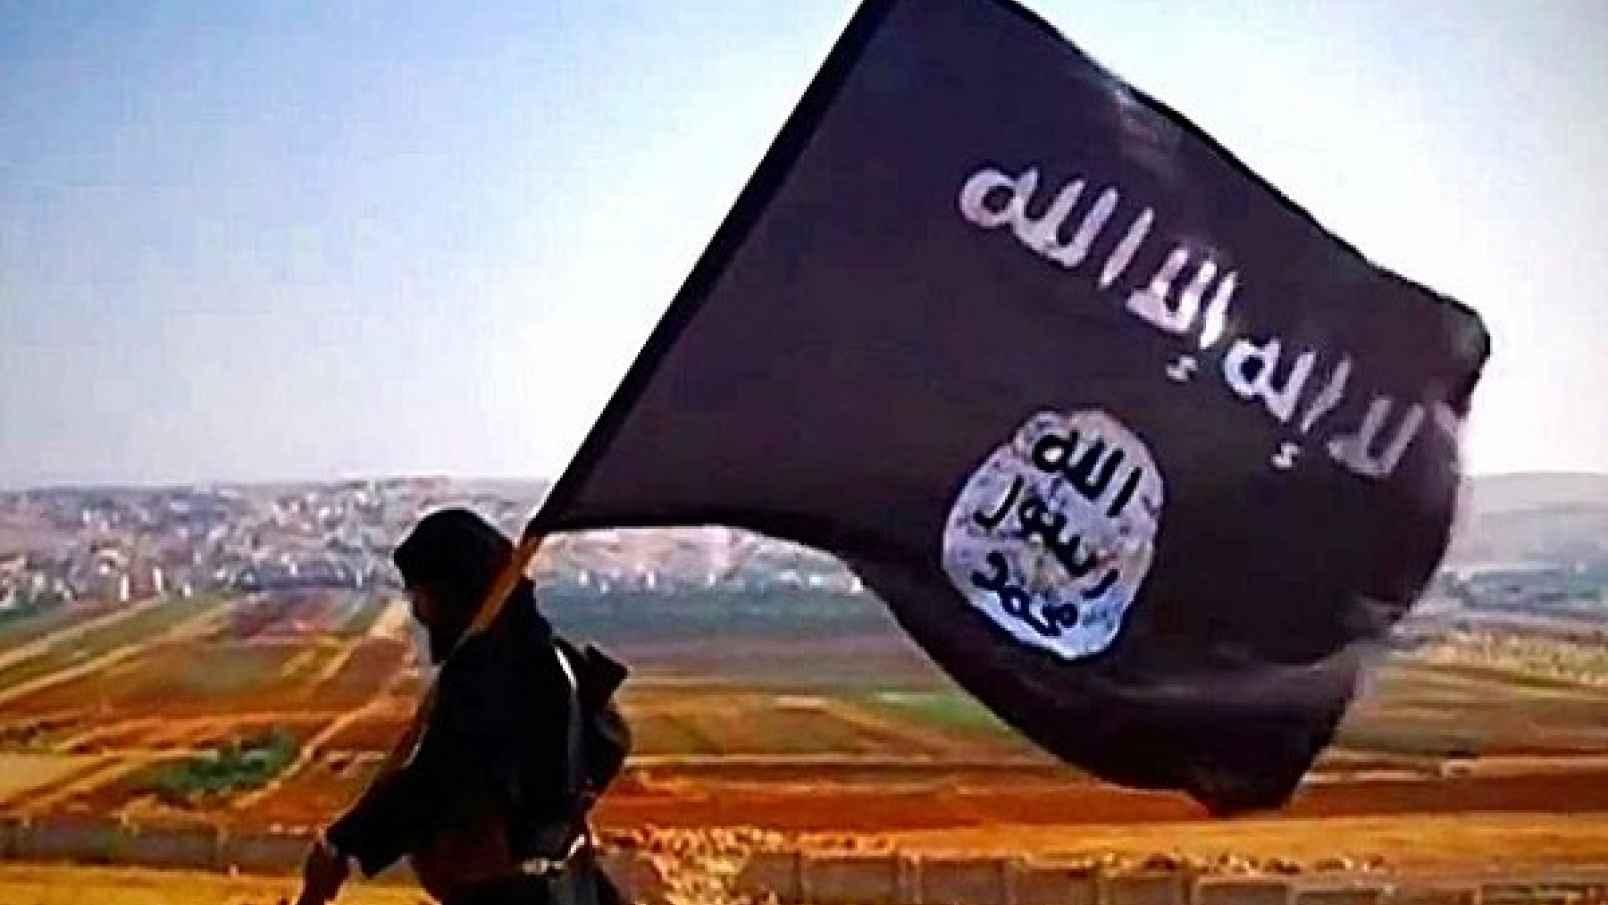 4Facebook-ISISFlagManIconicWalingLeft74kb